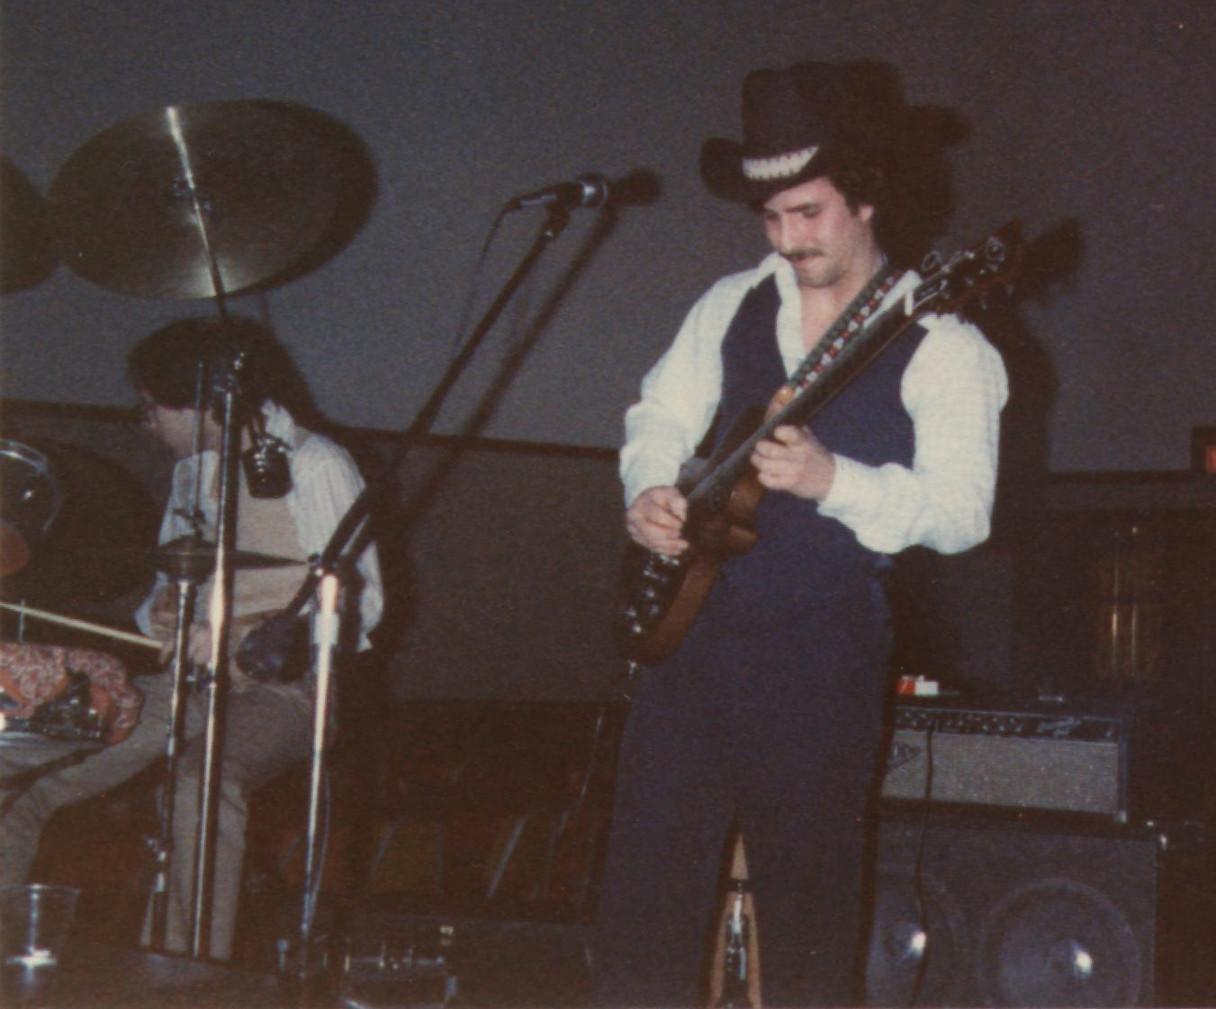 Steve, George - Feb 1980